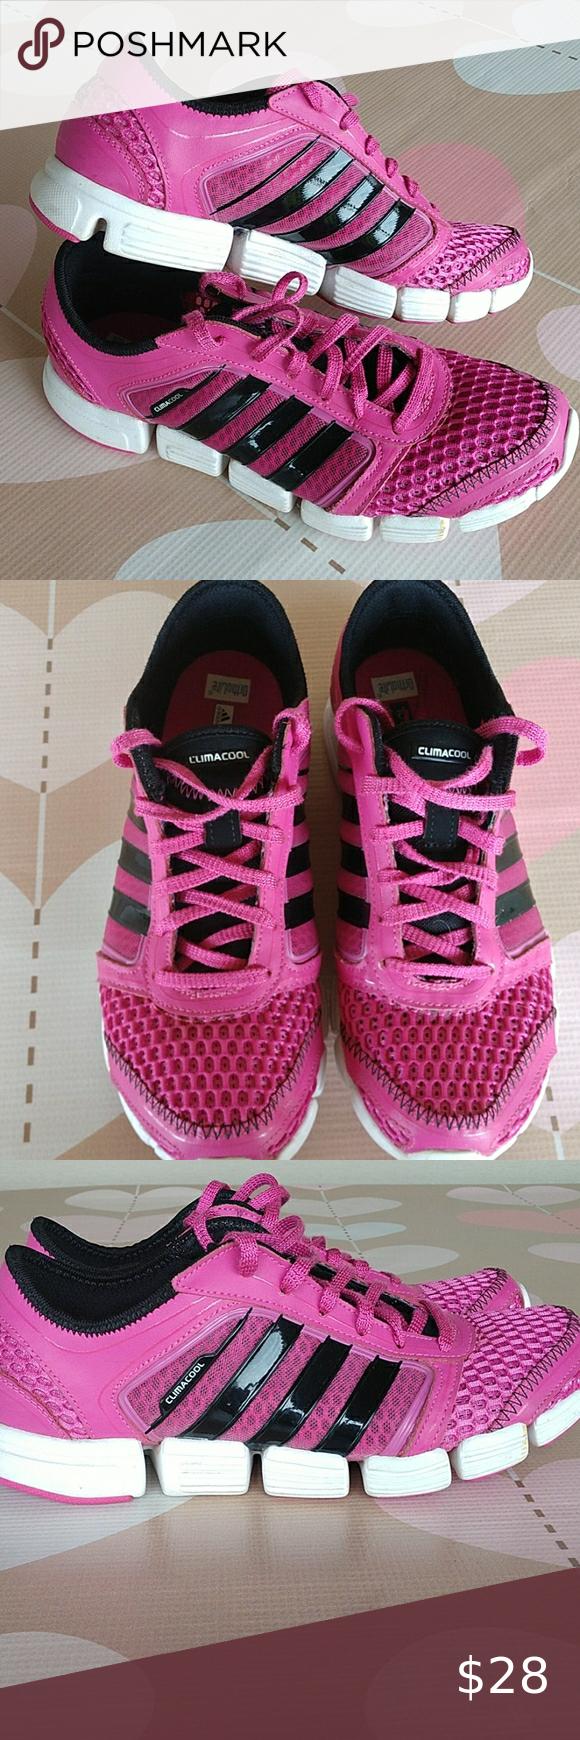 Adidas climacool ortholite sneakers